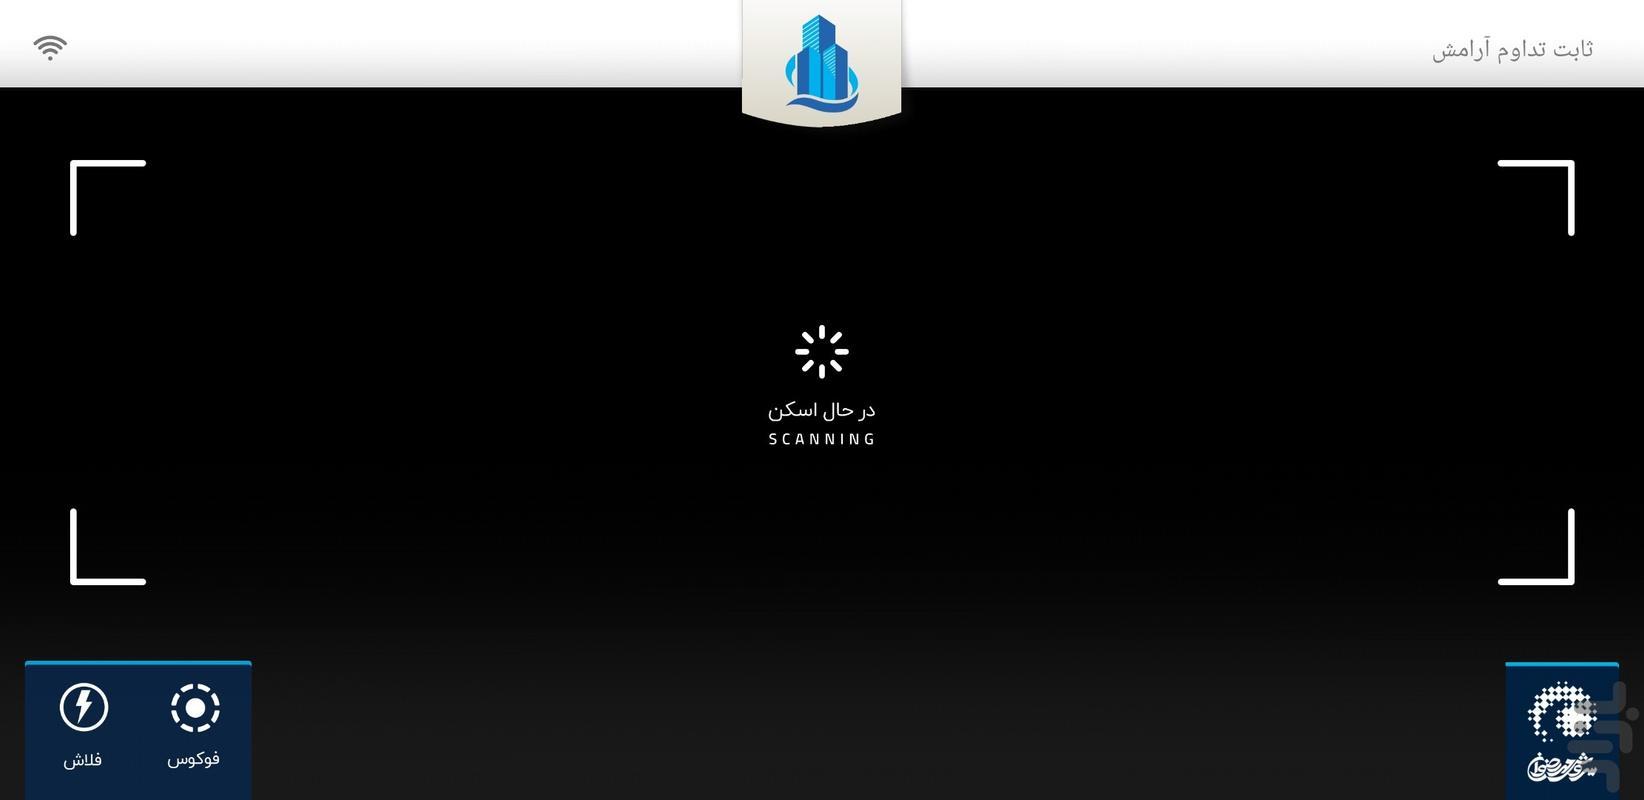 تداوم آرامش - عکس برنامه موبایلی اندروید